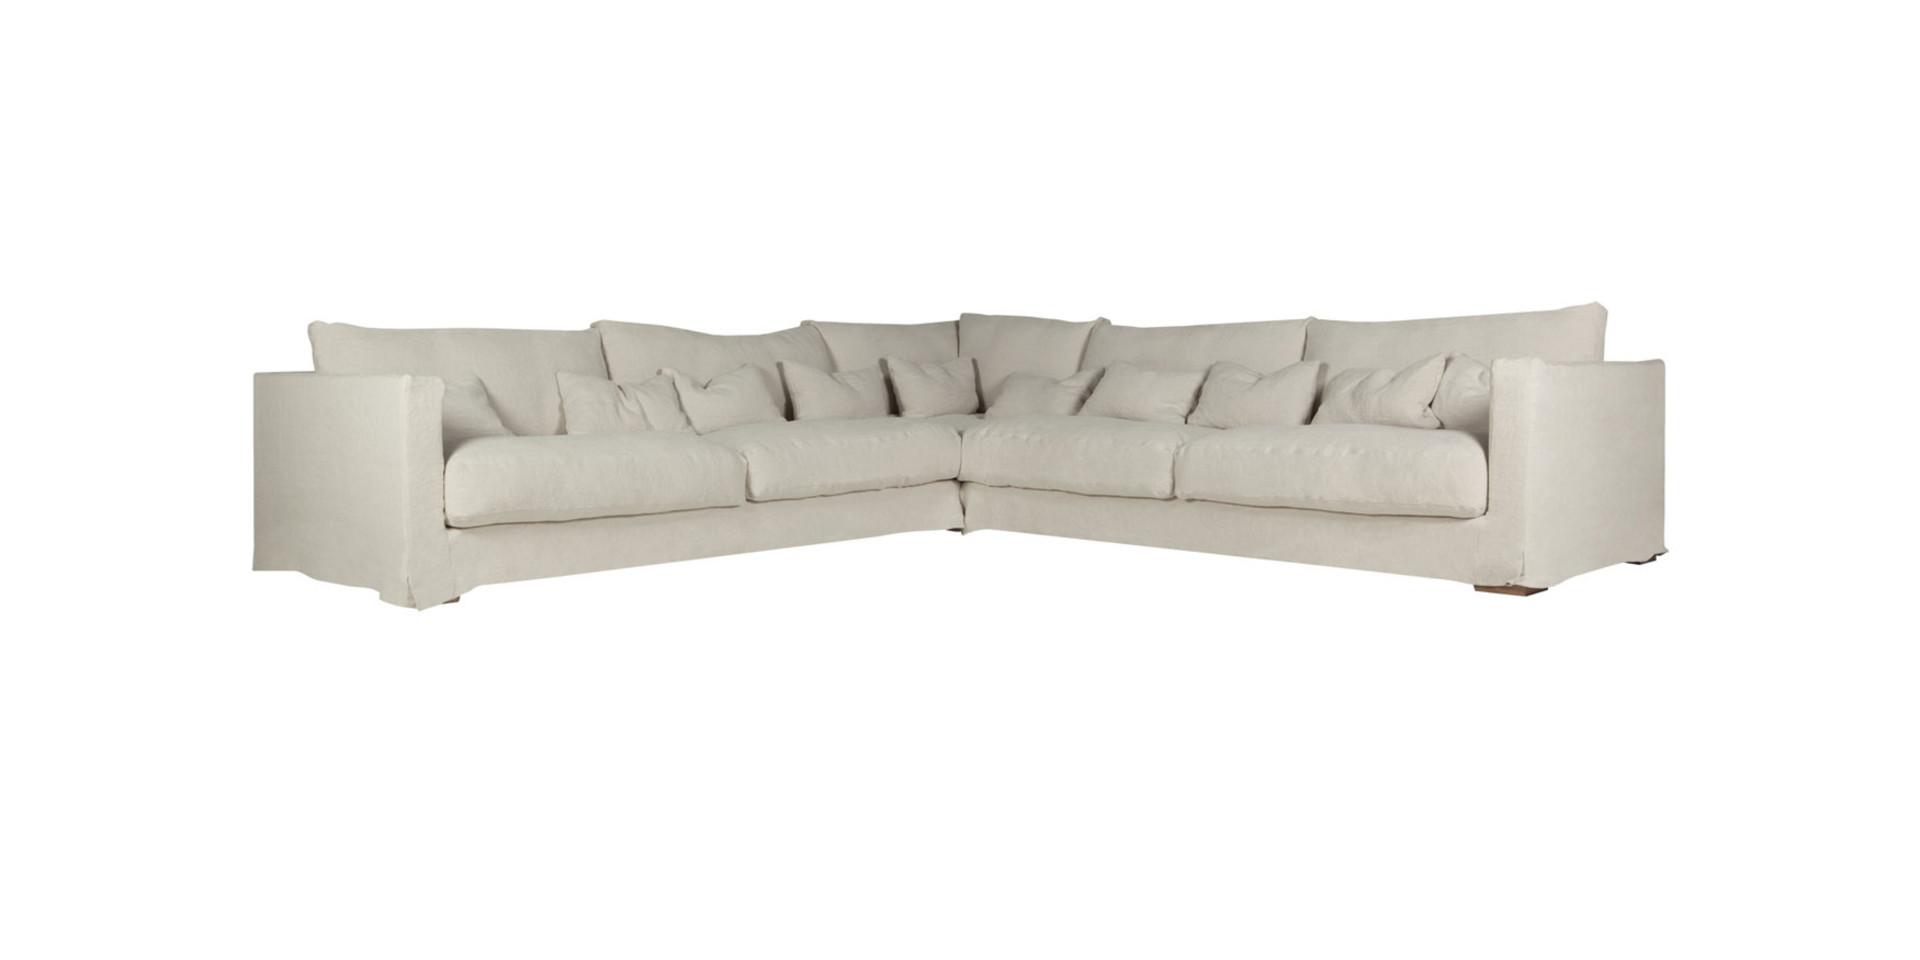 sits-heaven-angle-set8_linen007_natur_2